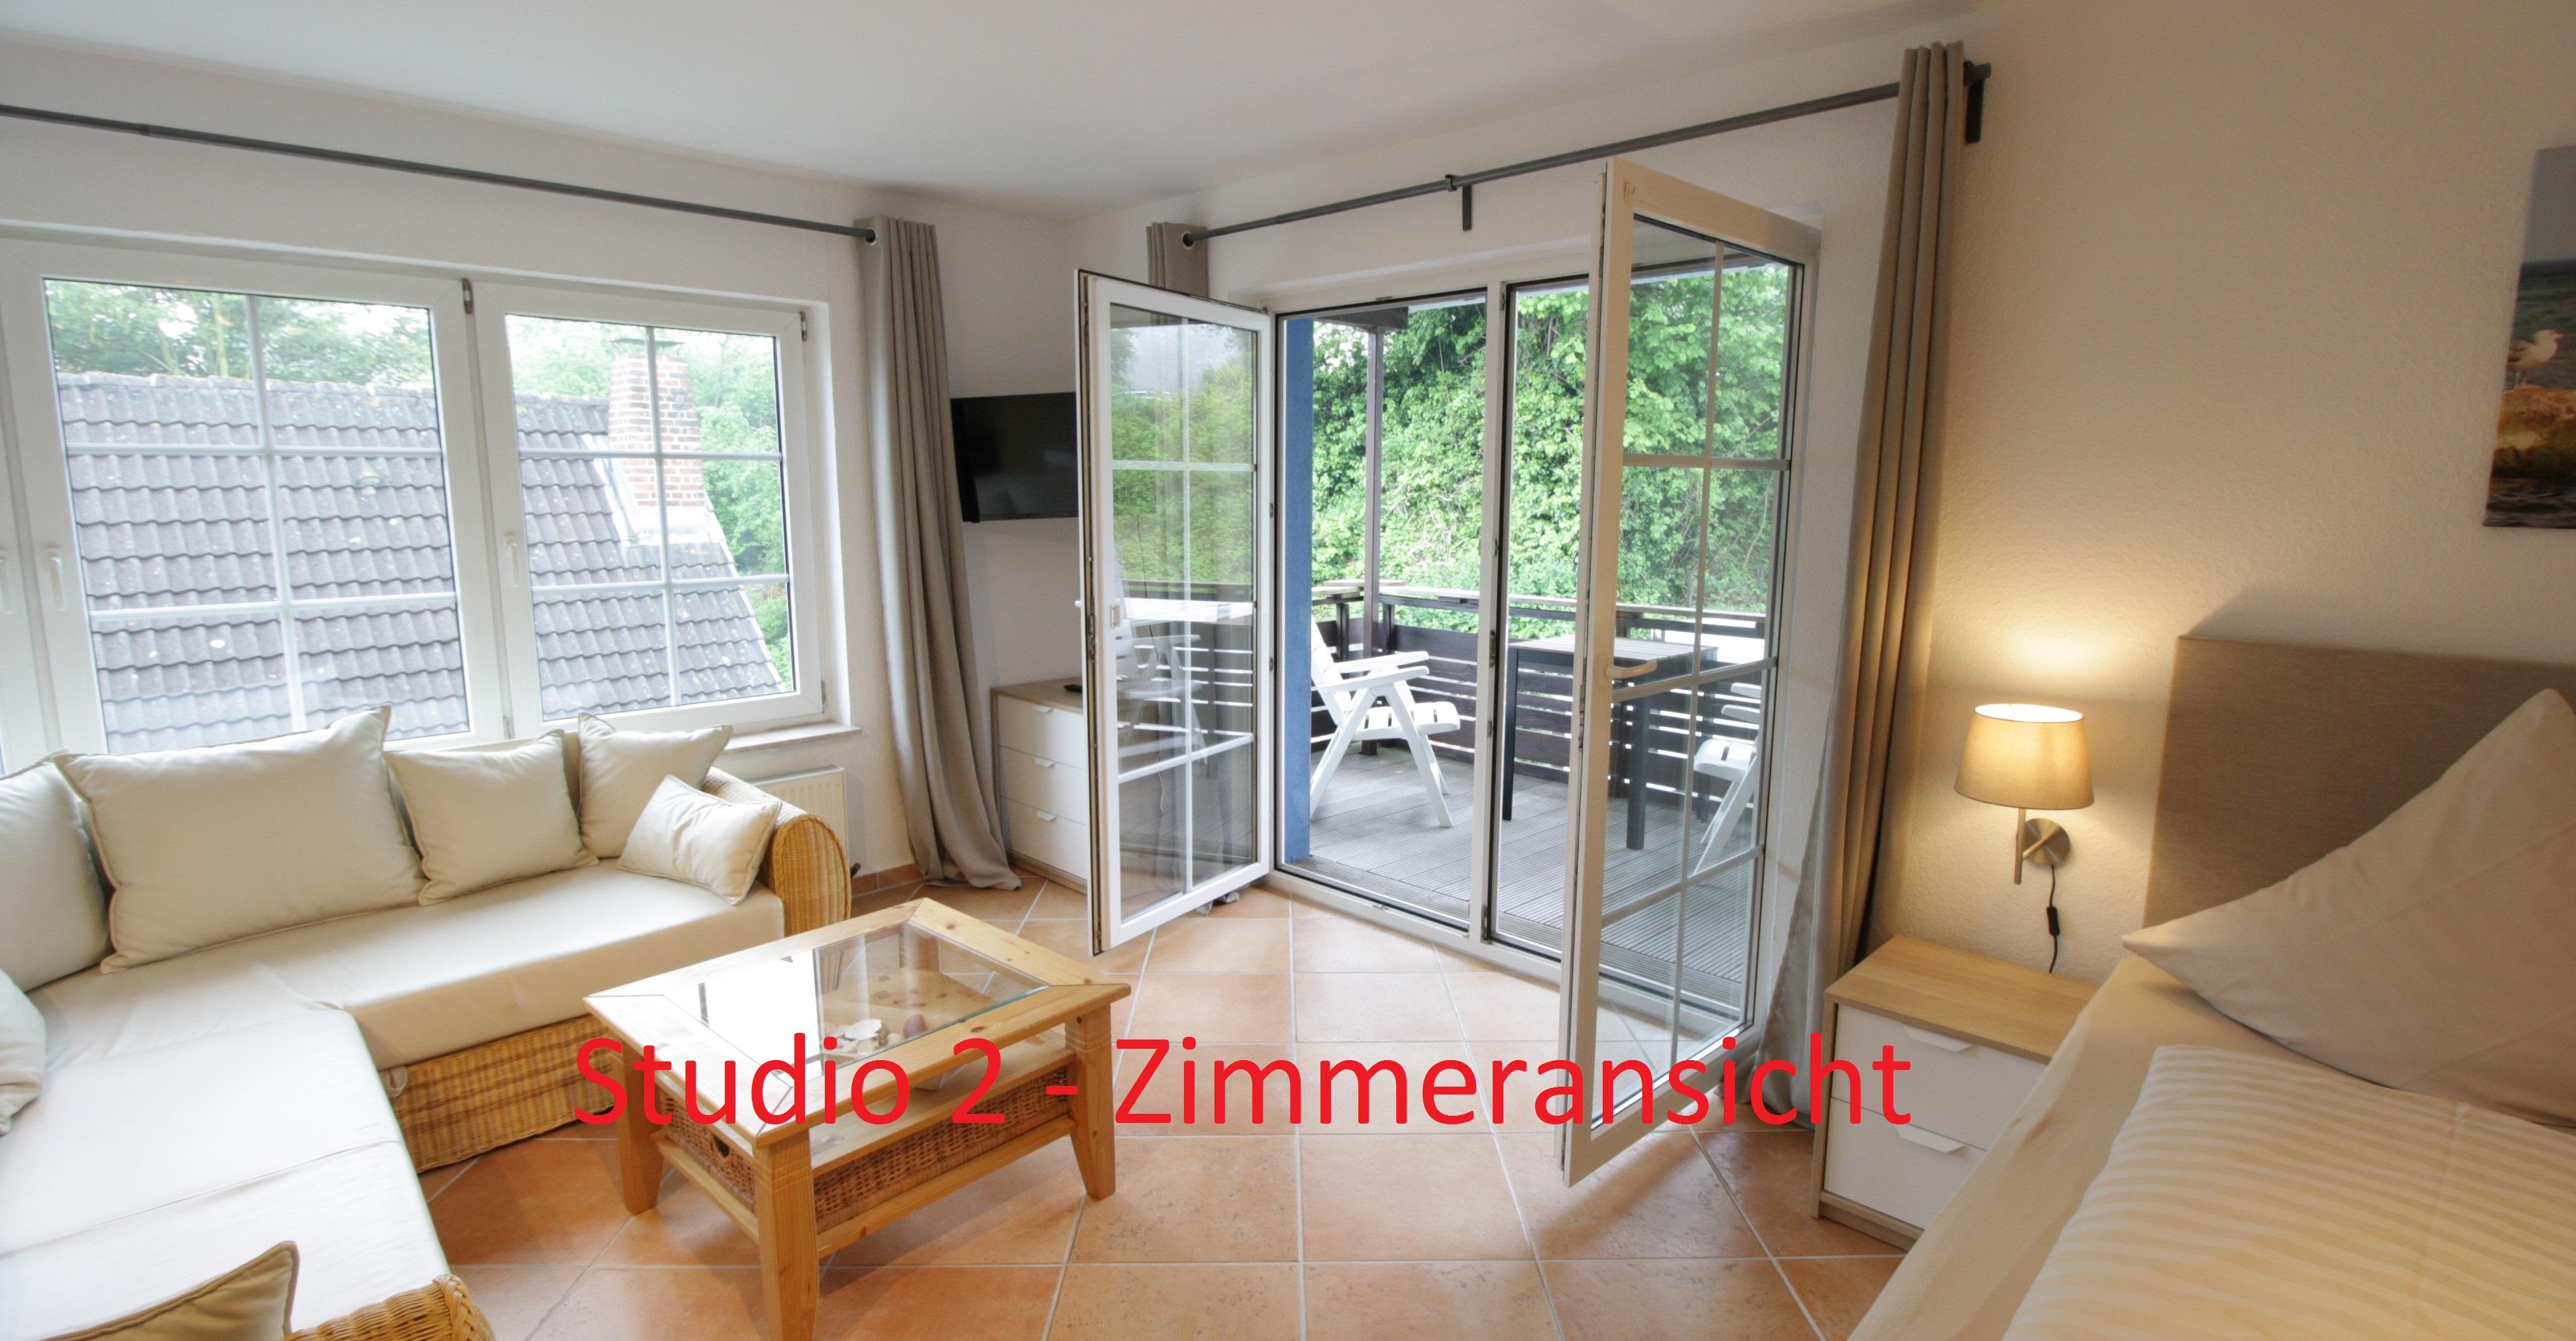 Studio mit Balkon